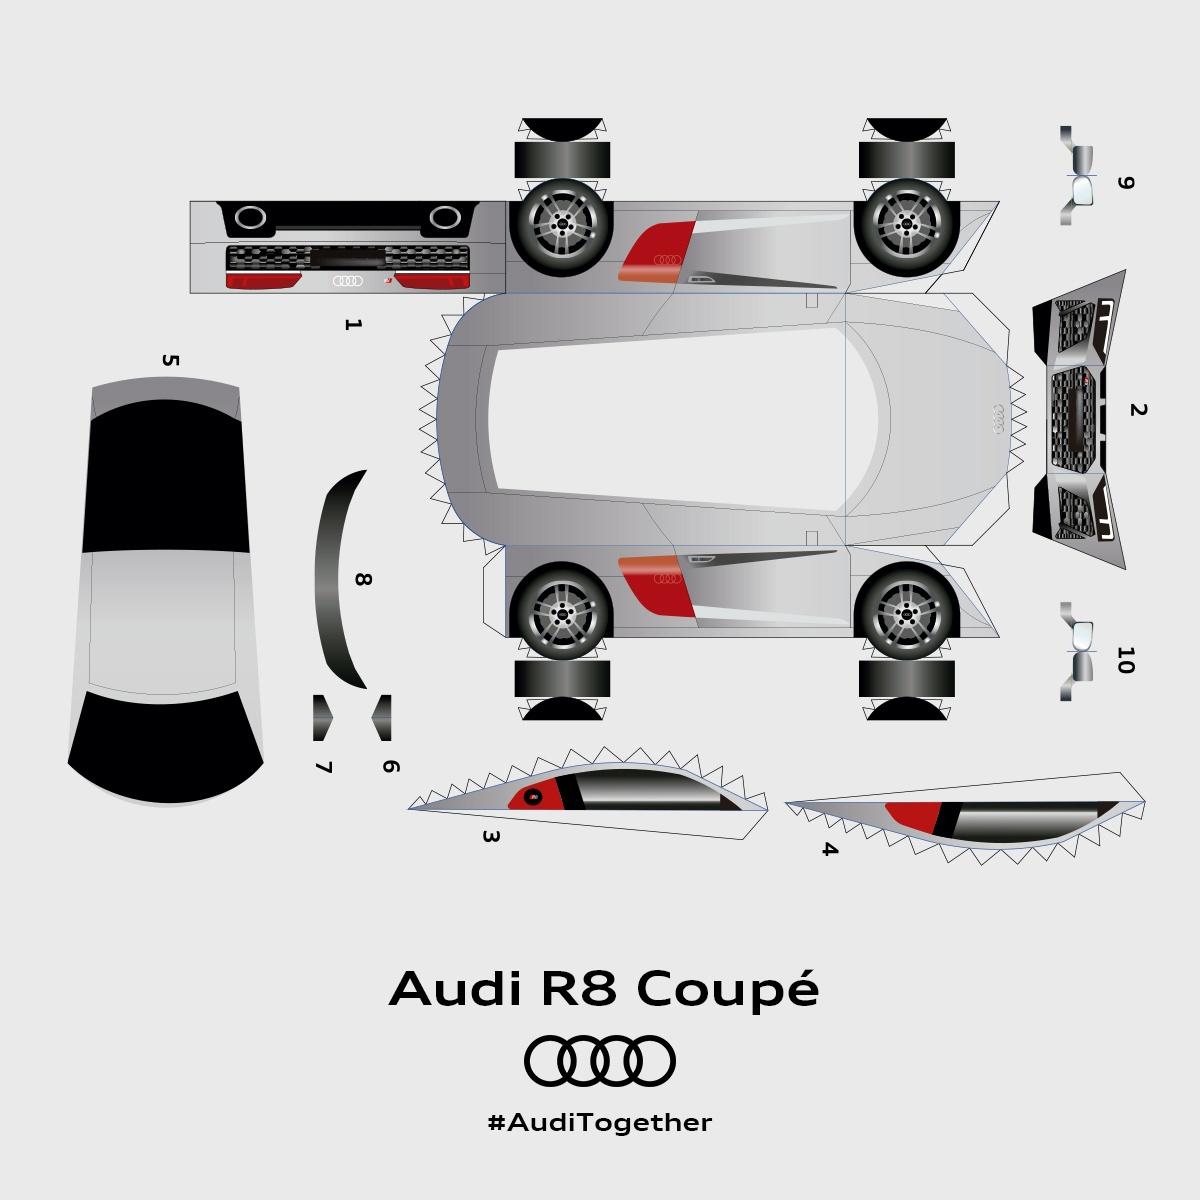 Audi Celebrates Quattro To Mayo With Quattro Cutouts